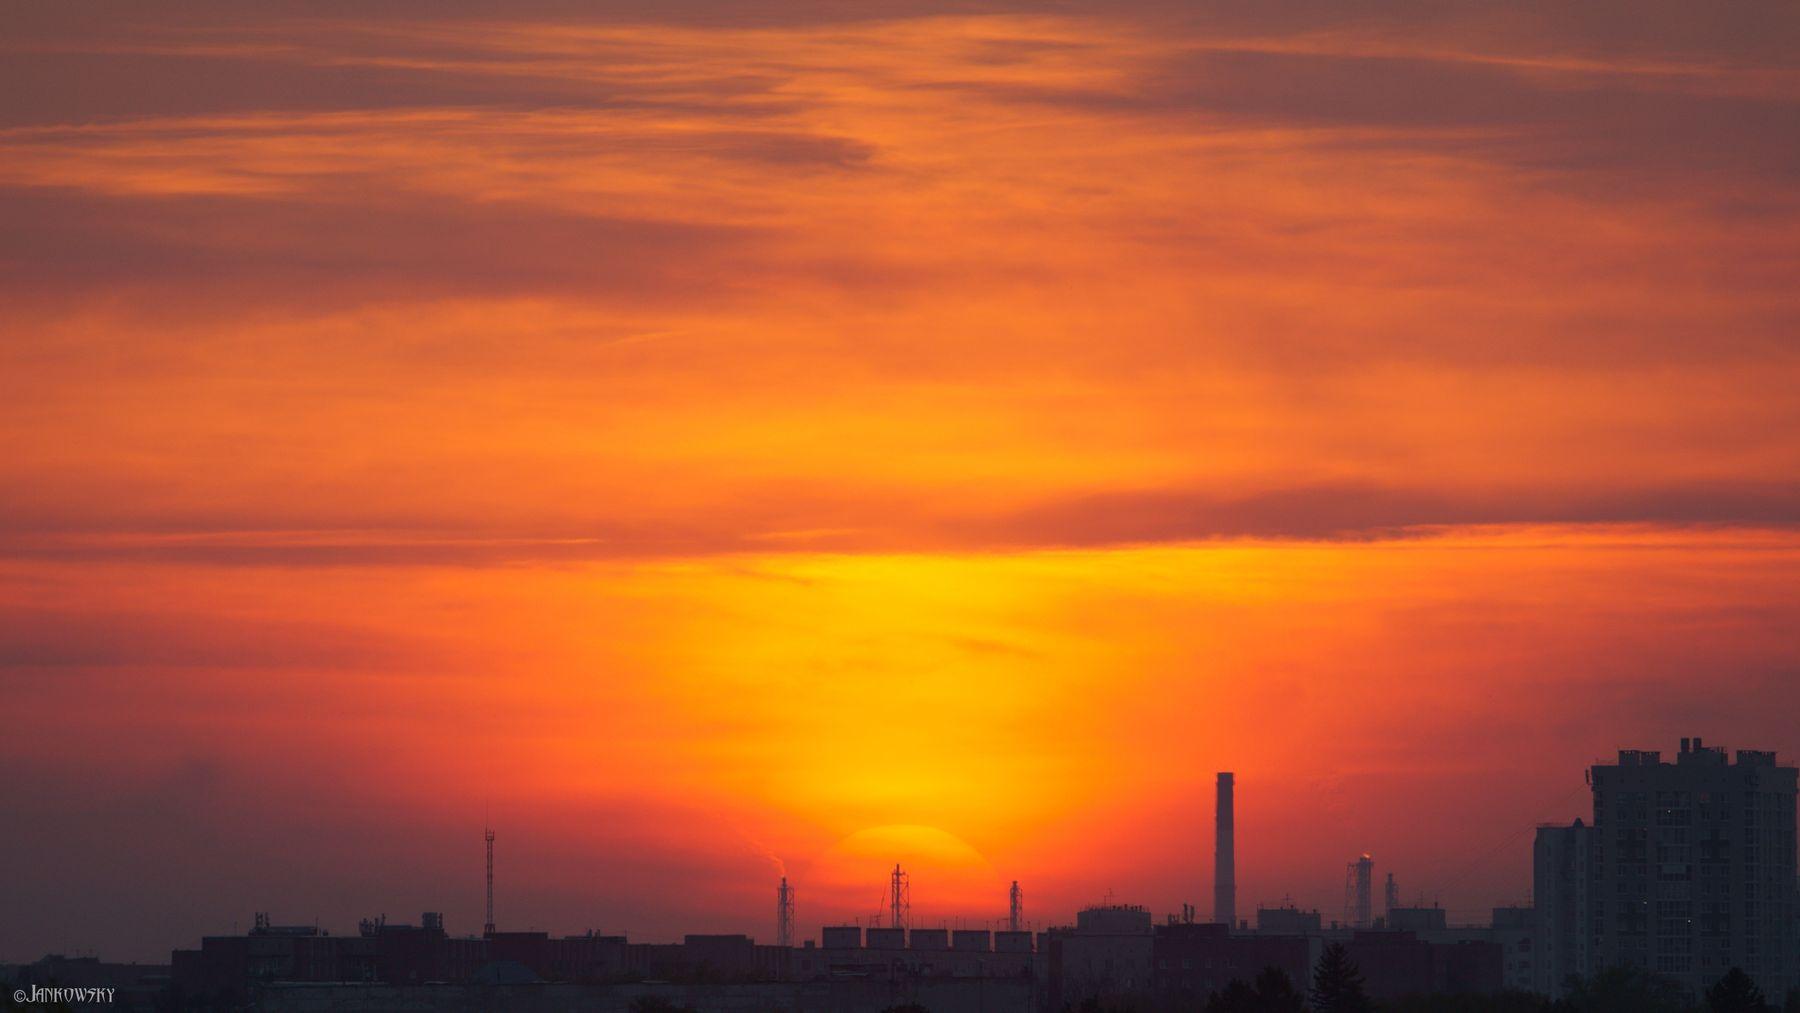 Адовое Пекло 11.05.21  - транзит по факелам нефтезавода омск пекло солнце нефтезавод индустриальный трубы sigma 120-300mm sa